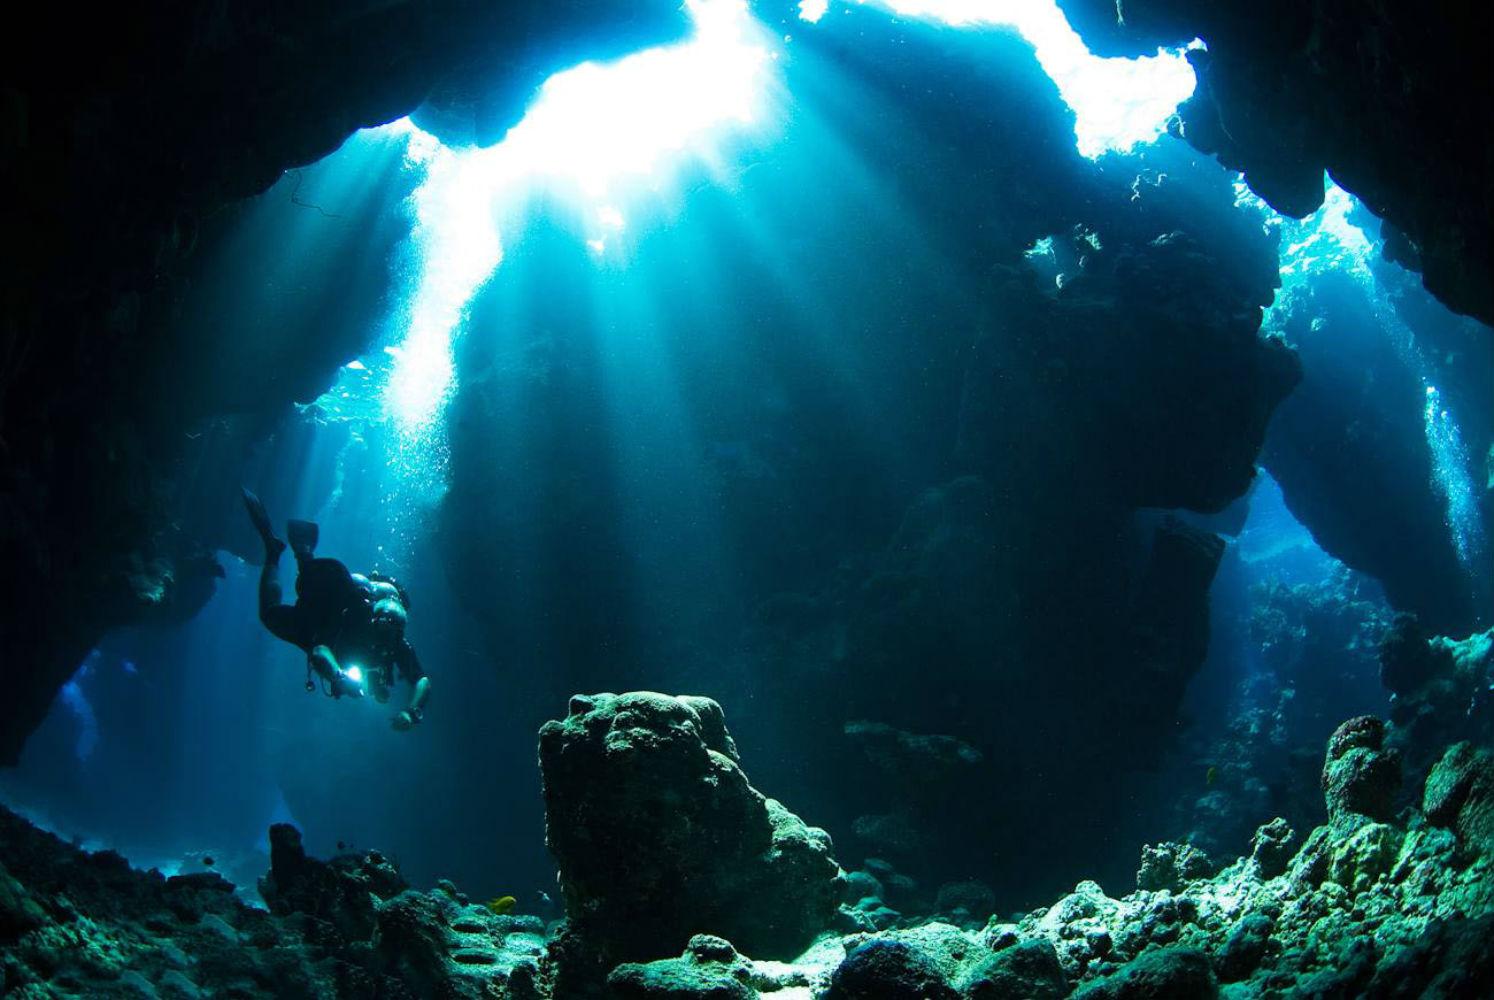 scuba diving wallpaper wallpapers - photo #24